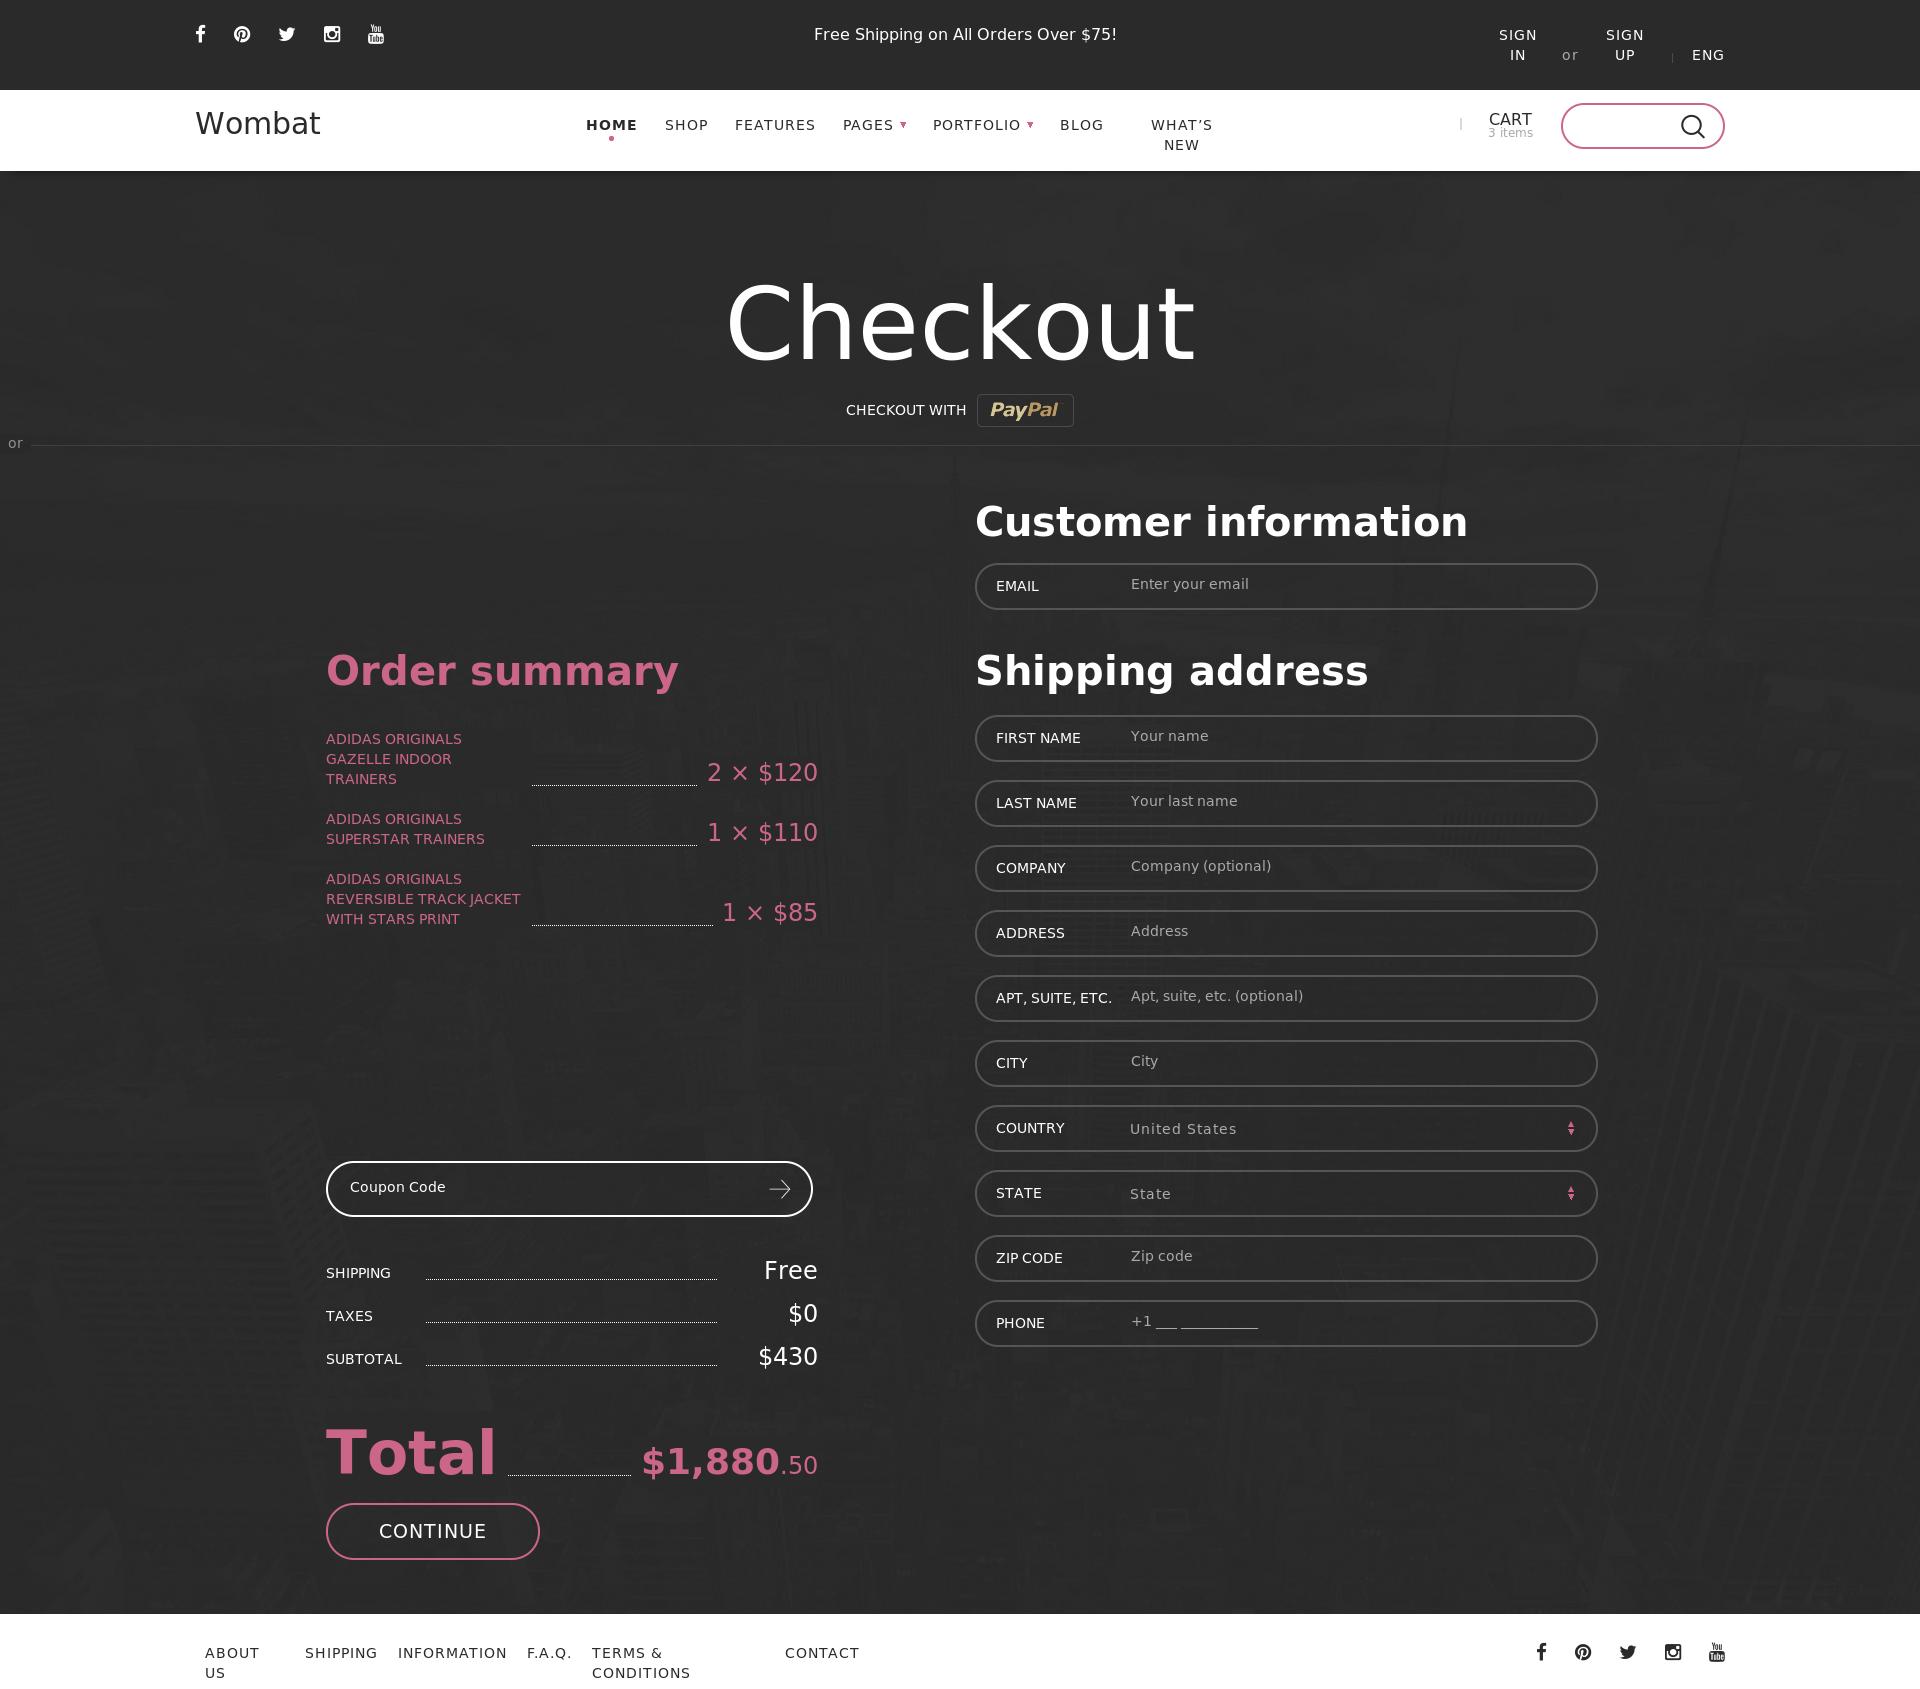 Wombat - Адаптивная верстка шаблона интернет магазина для продаже на Themeforest